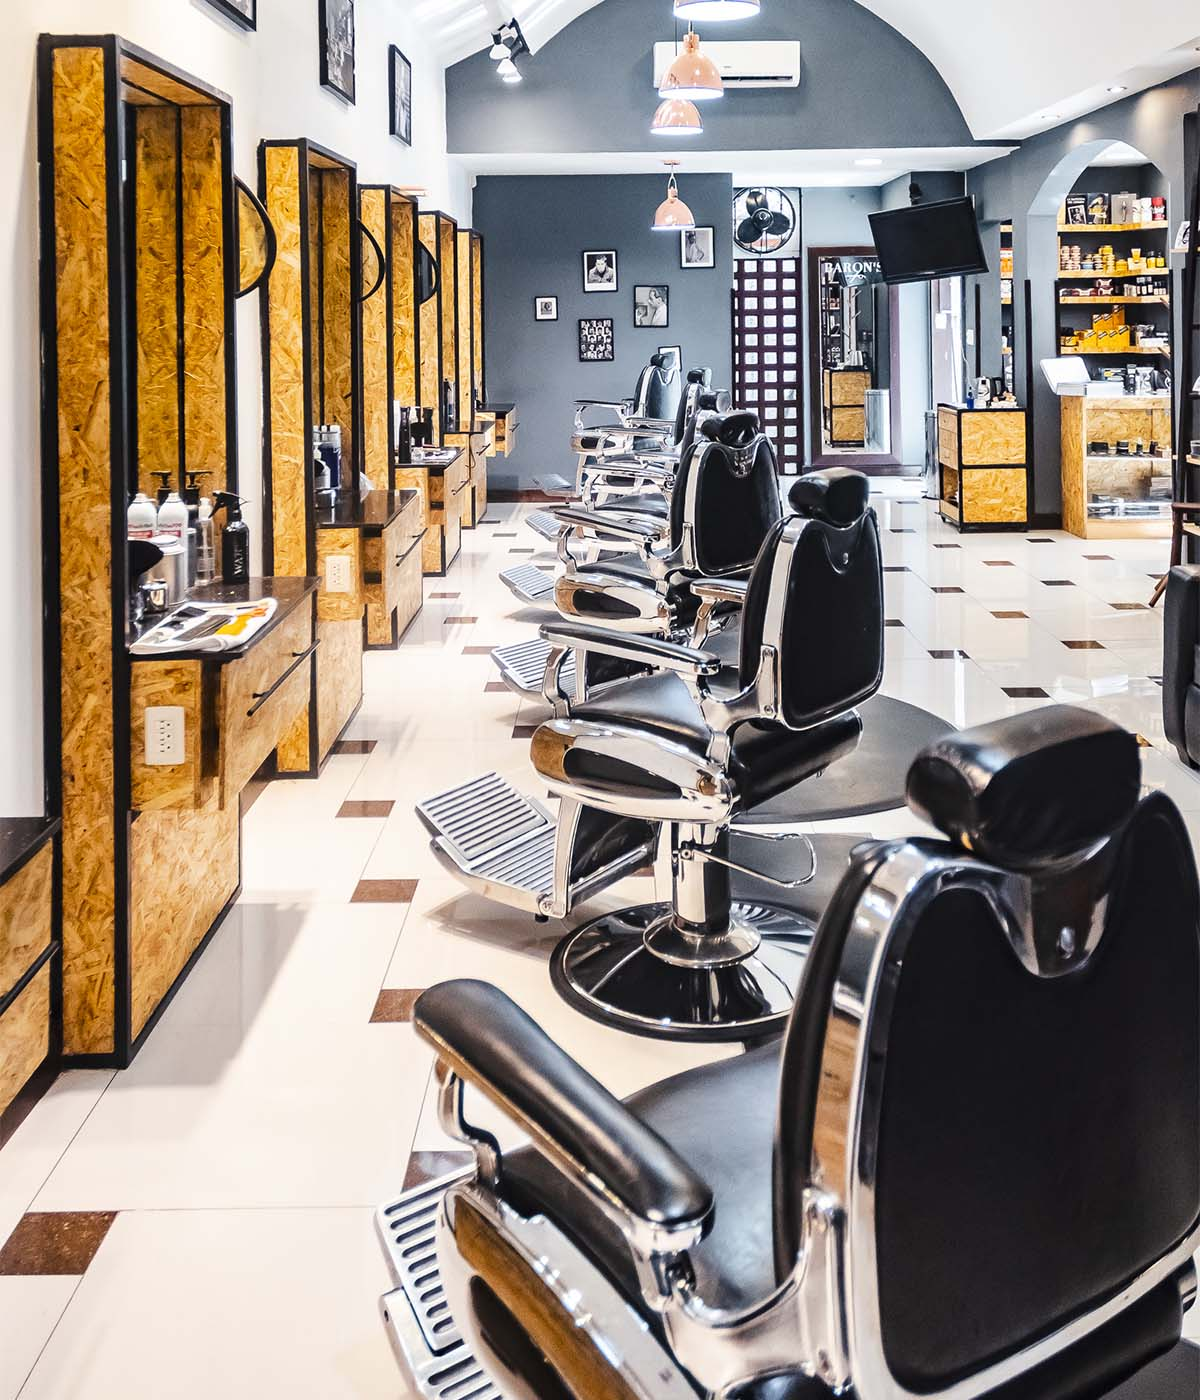 Barbería zona 14